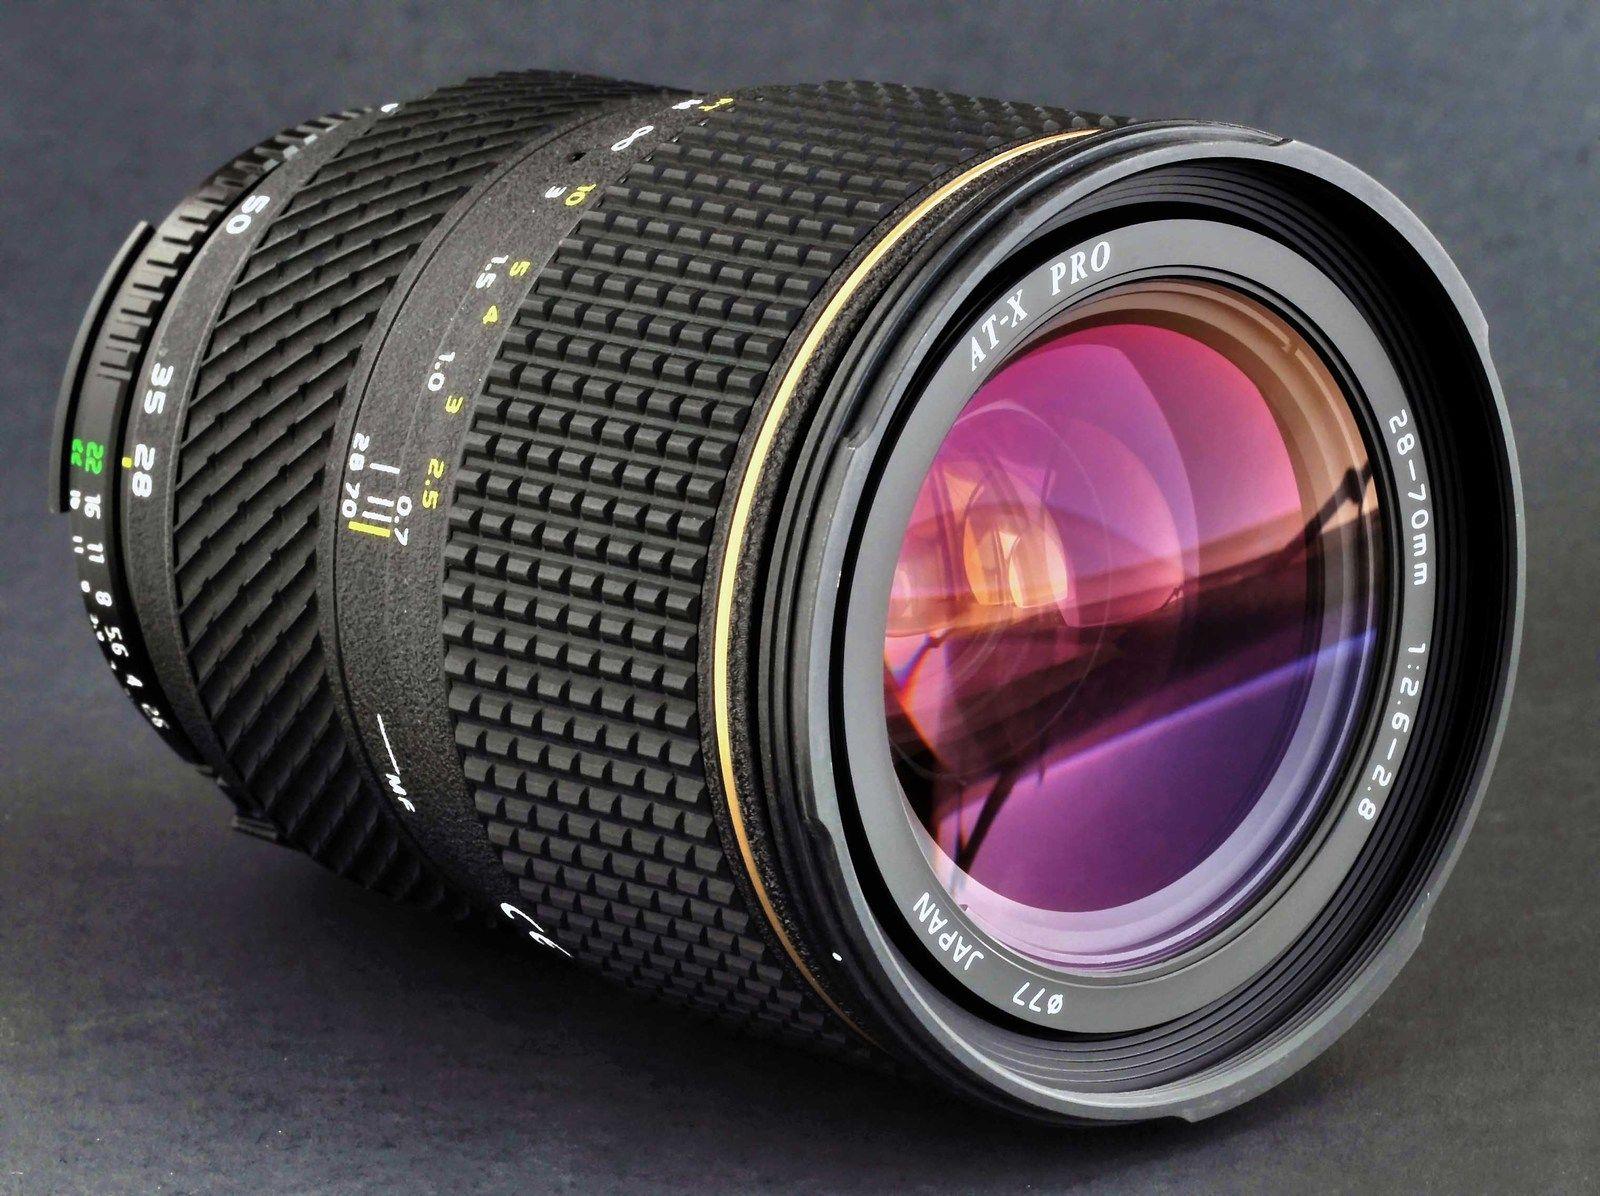 Nikon Af 28 80mm F2 6 2 8 Tokina At X Pro Zoom Lens 4 Nikon Dslrs D3 D700 Ex Lenses Used Cameras Lenses Photography Photography Gear